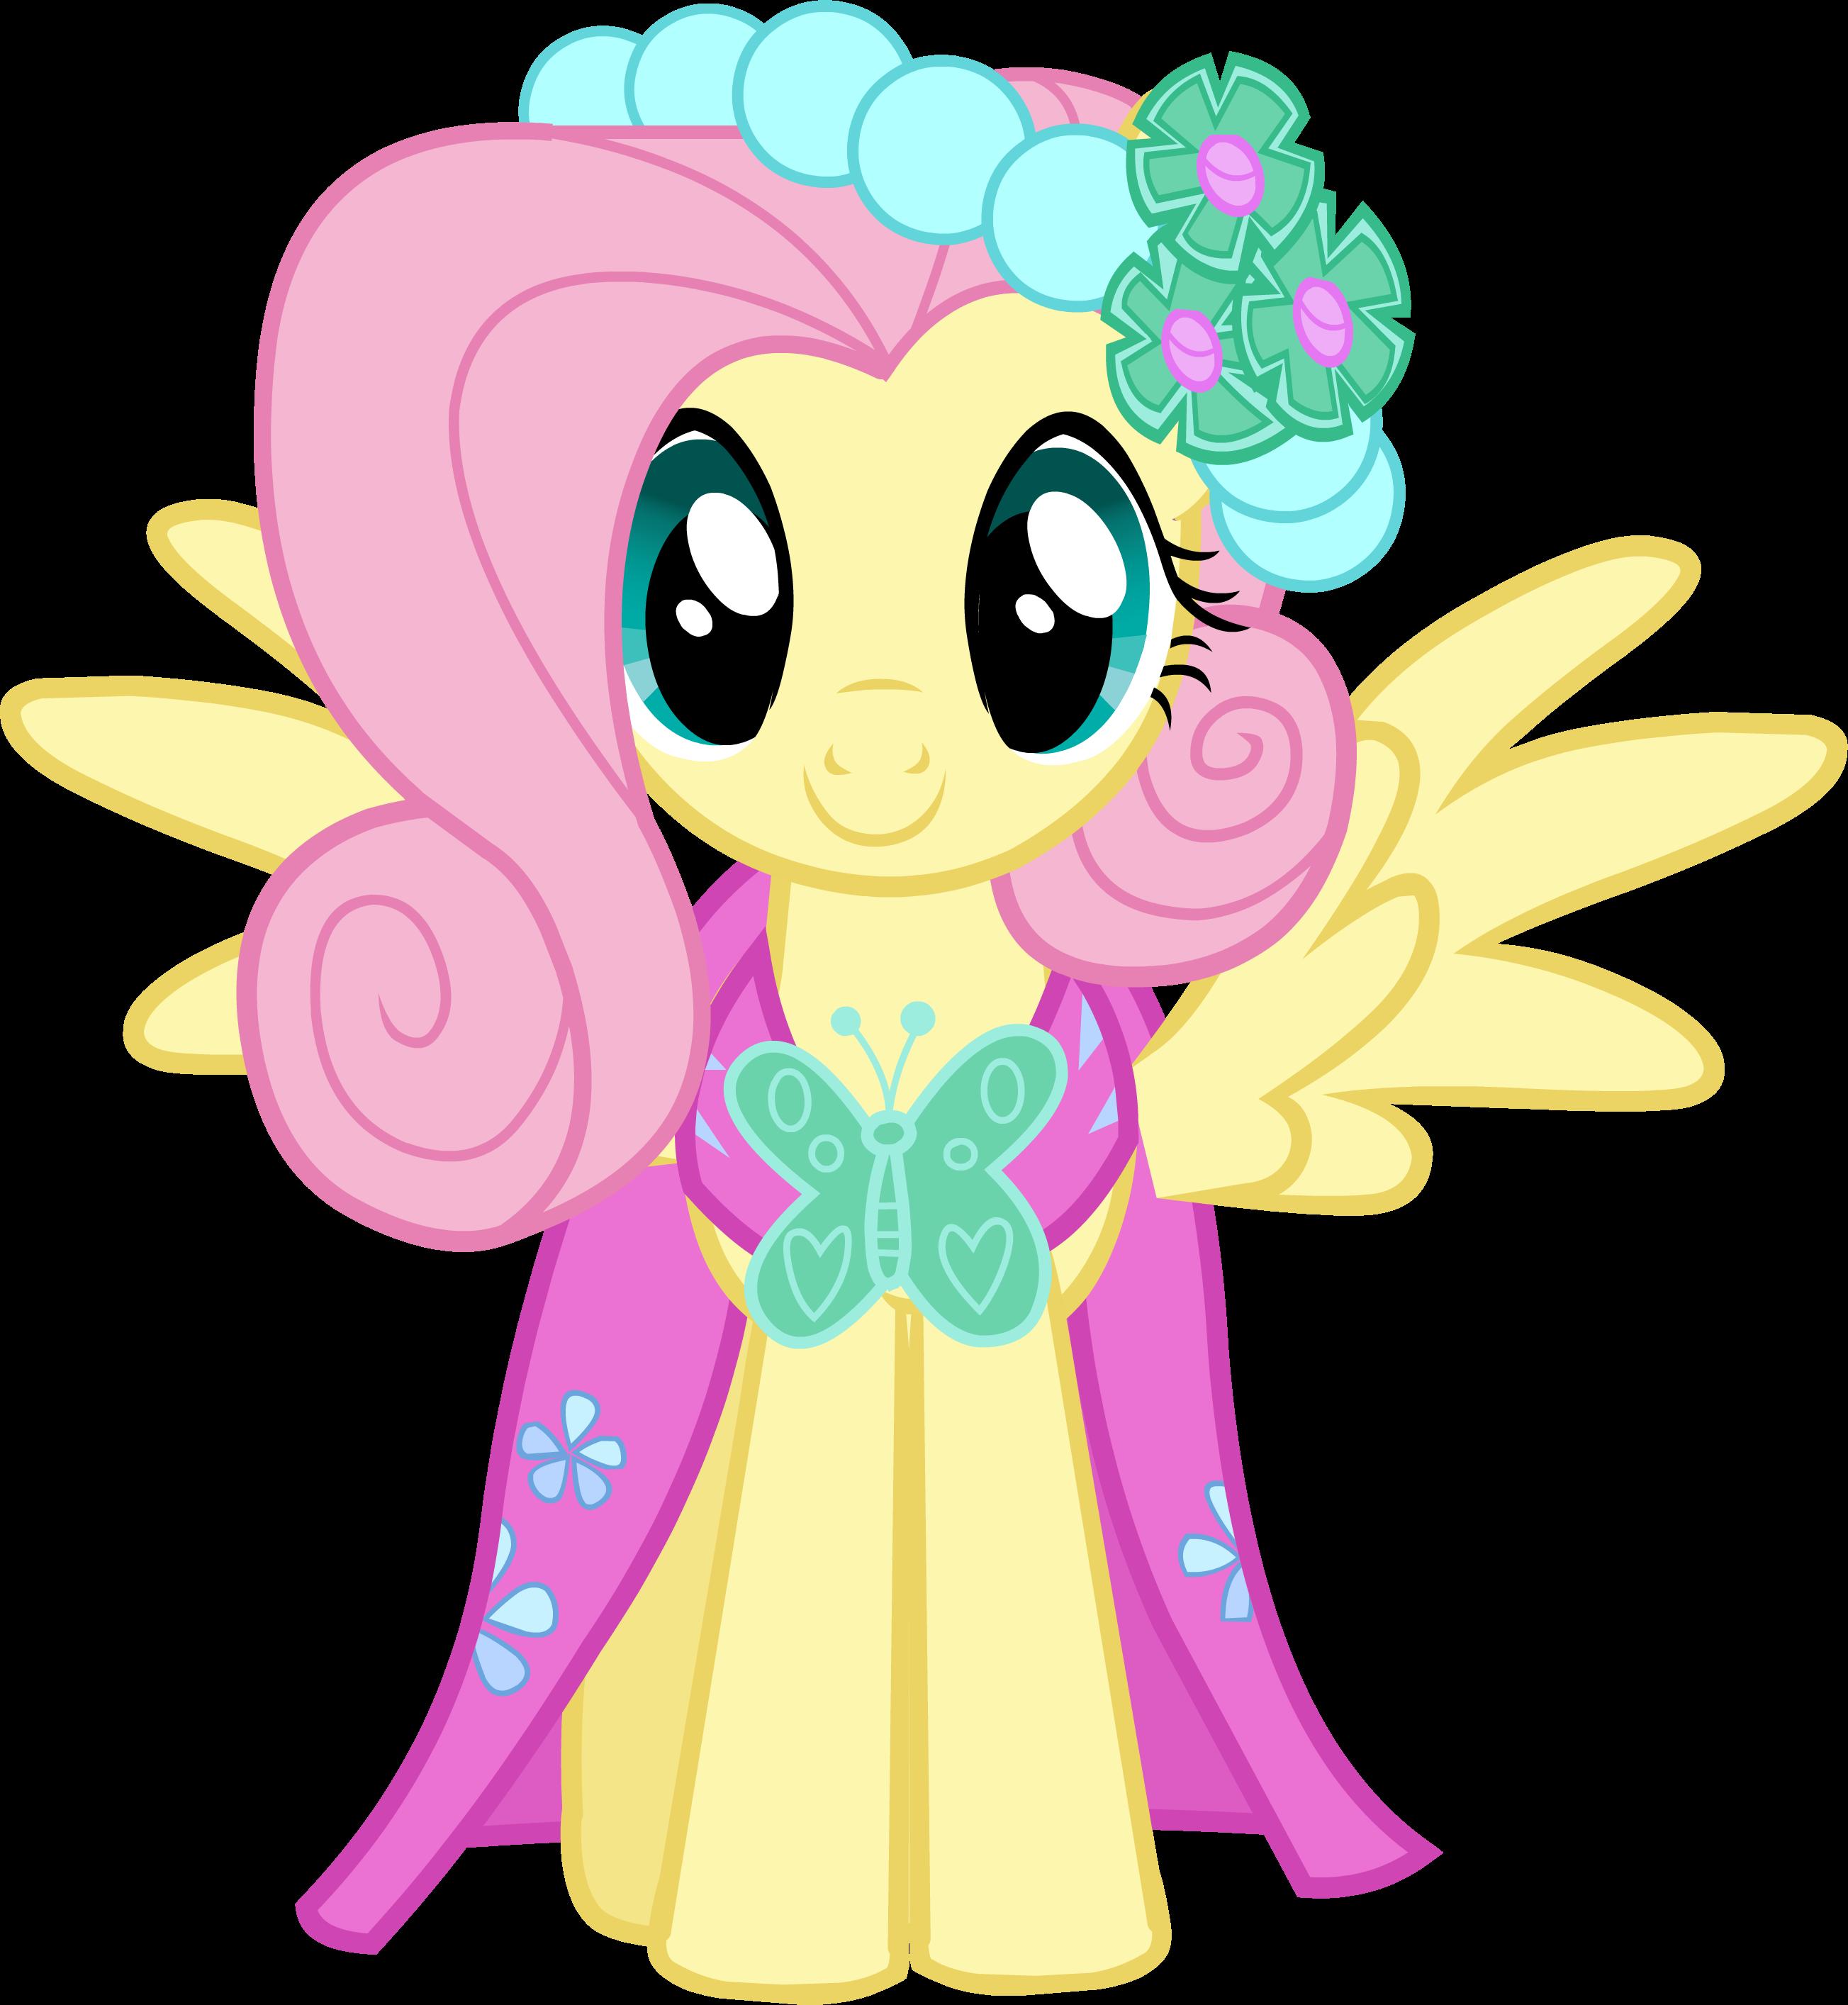 My Little Pony Wedding: Fluttershy At Princess Cadence & Shining Armor's Wedding